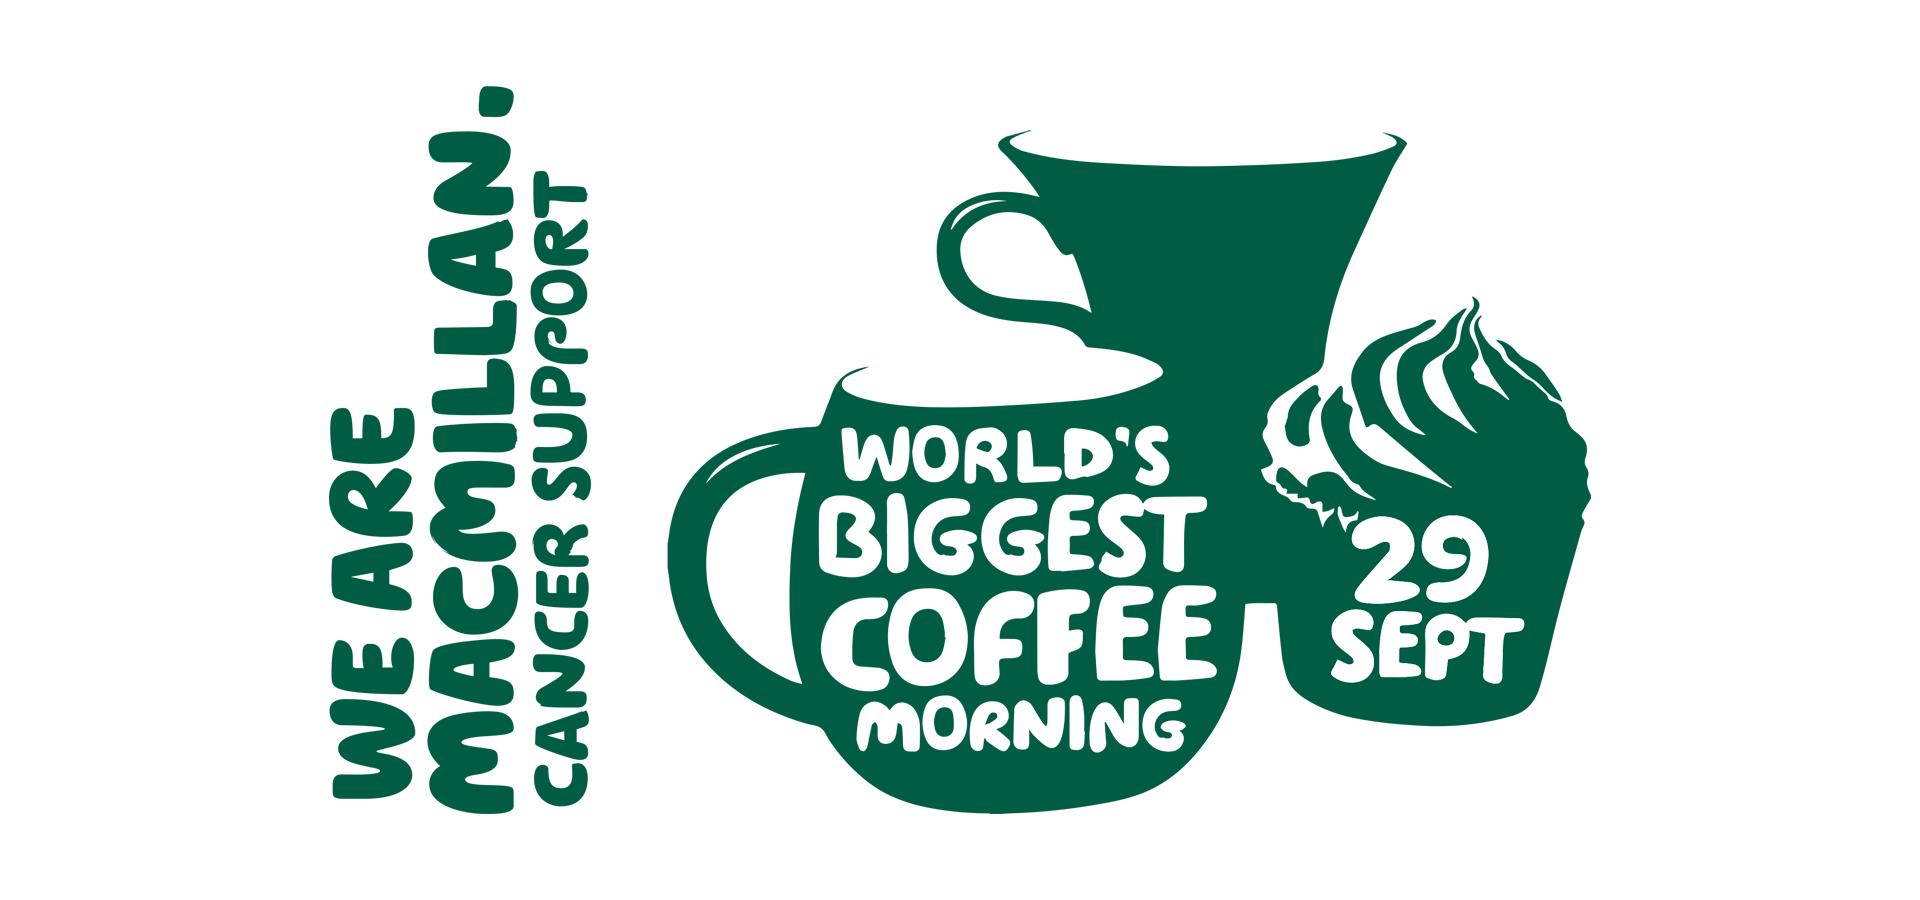 Macmillan: World's Biggest Coffee Morning